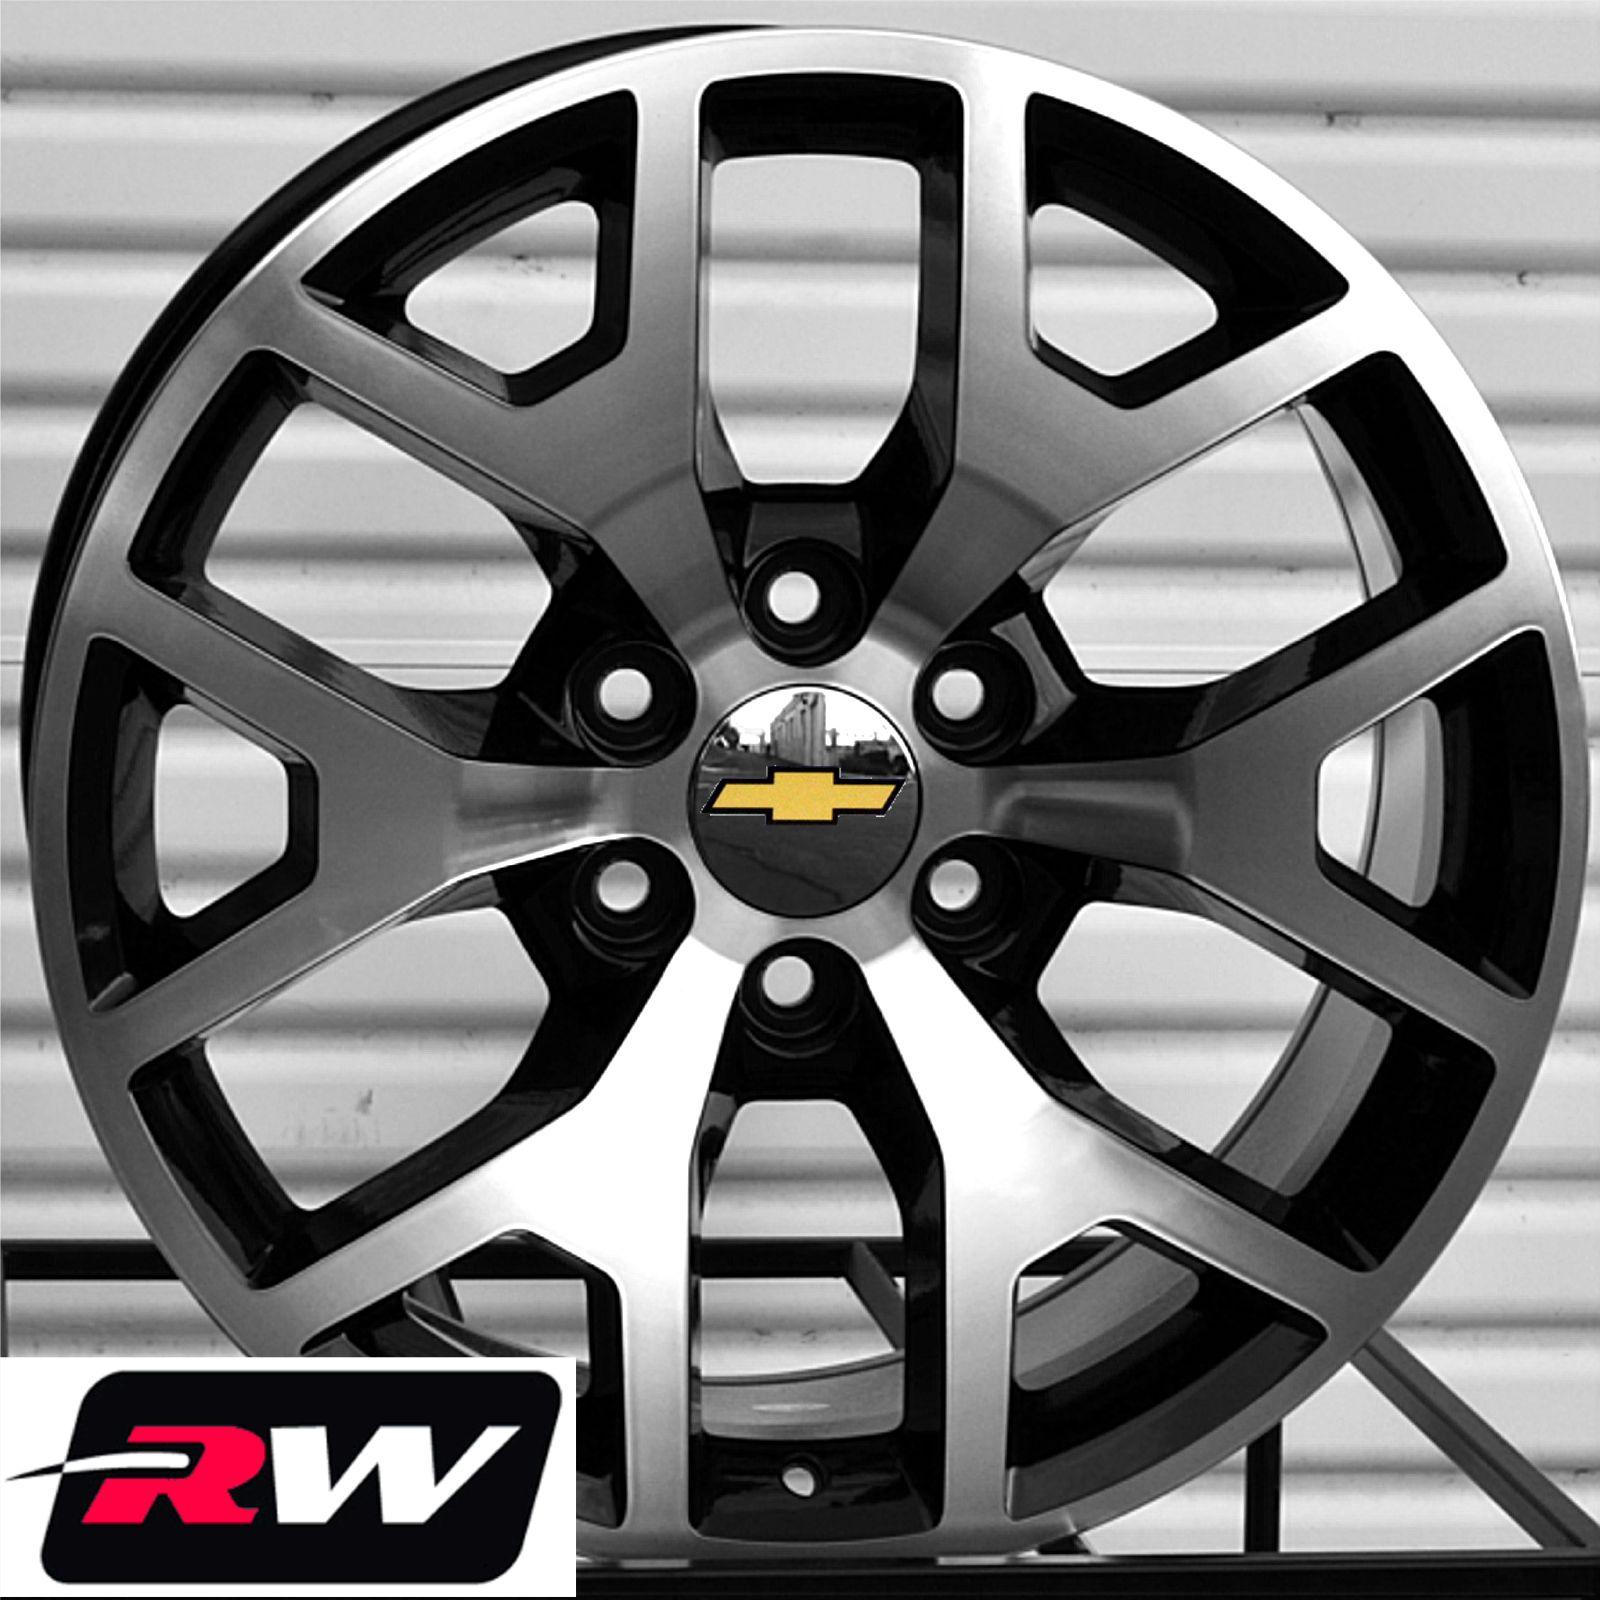 50 Inch Rims On Chevy : Silverado oe factory replica wheels quot inch black